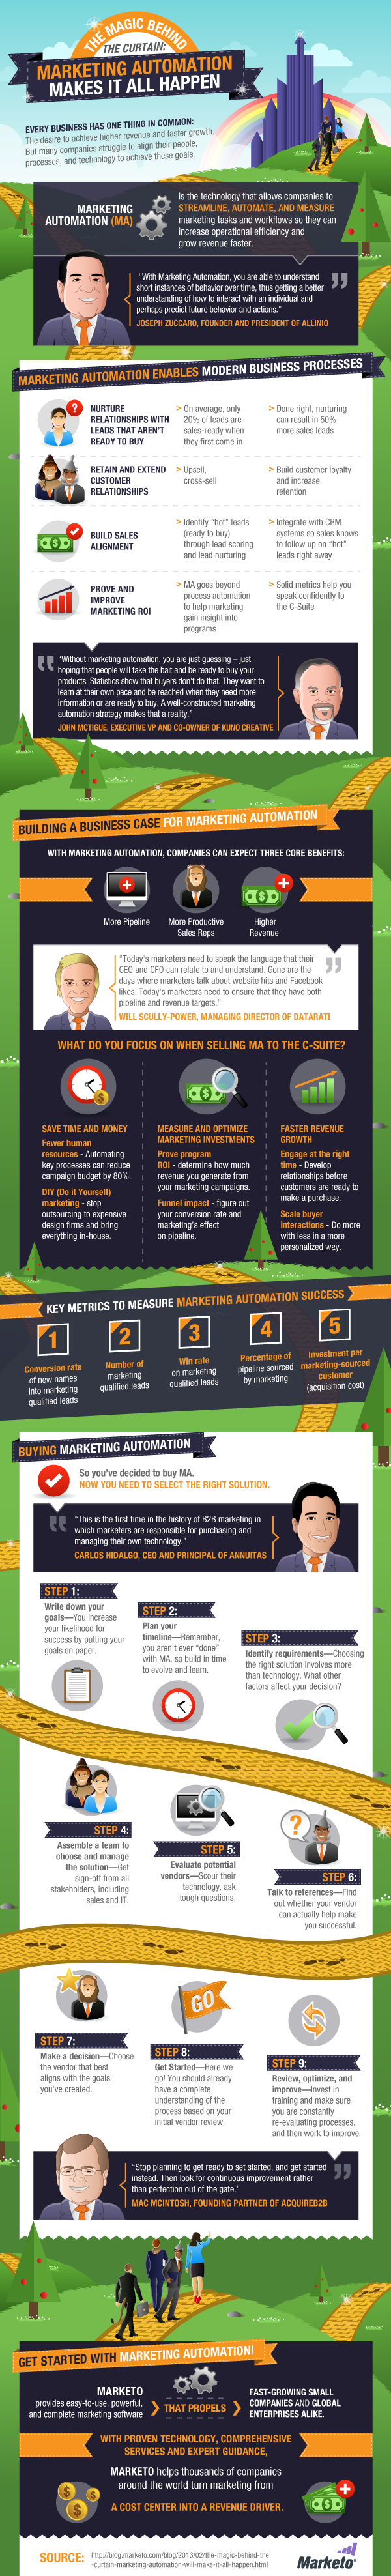 Marketo Marketing Automation InfoGraphic V3